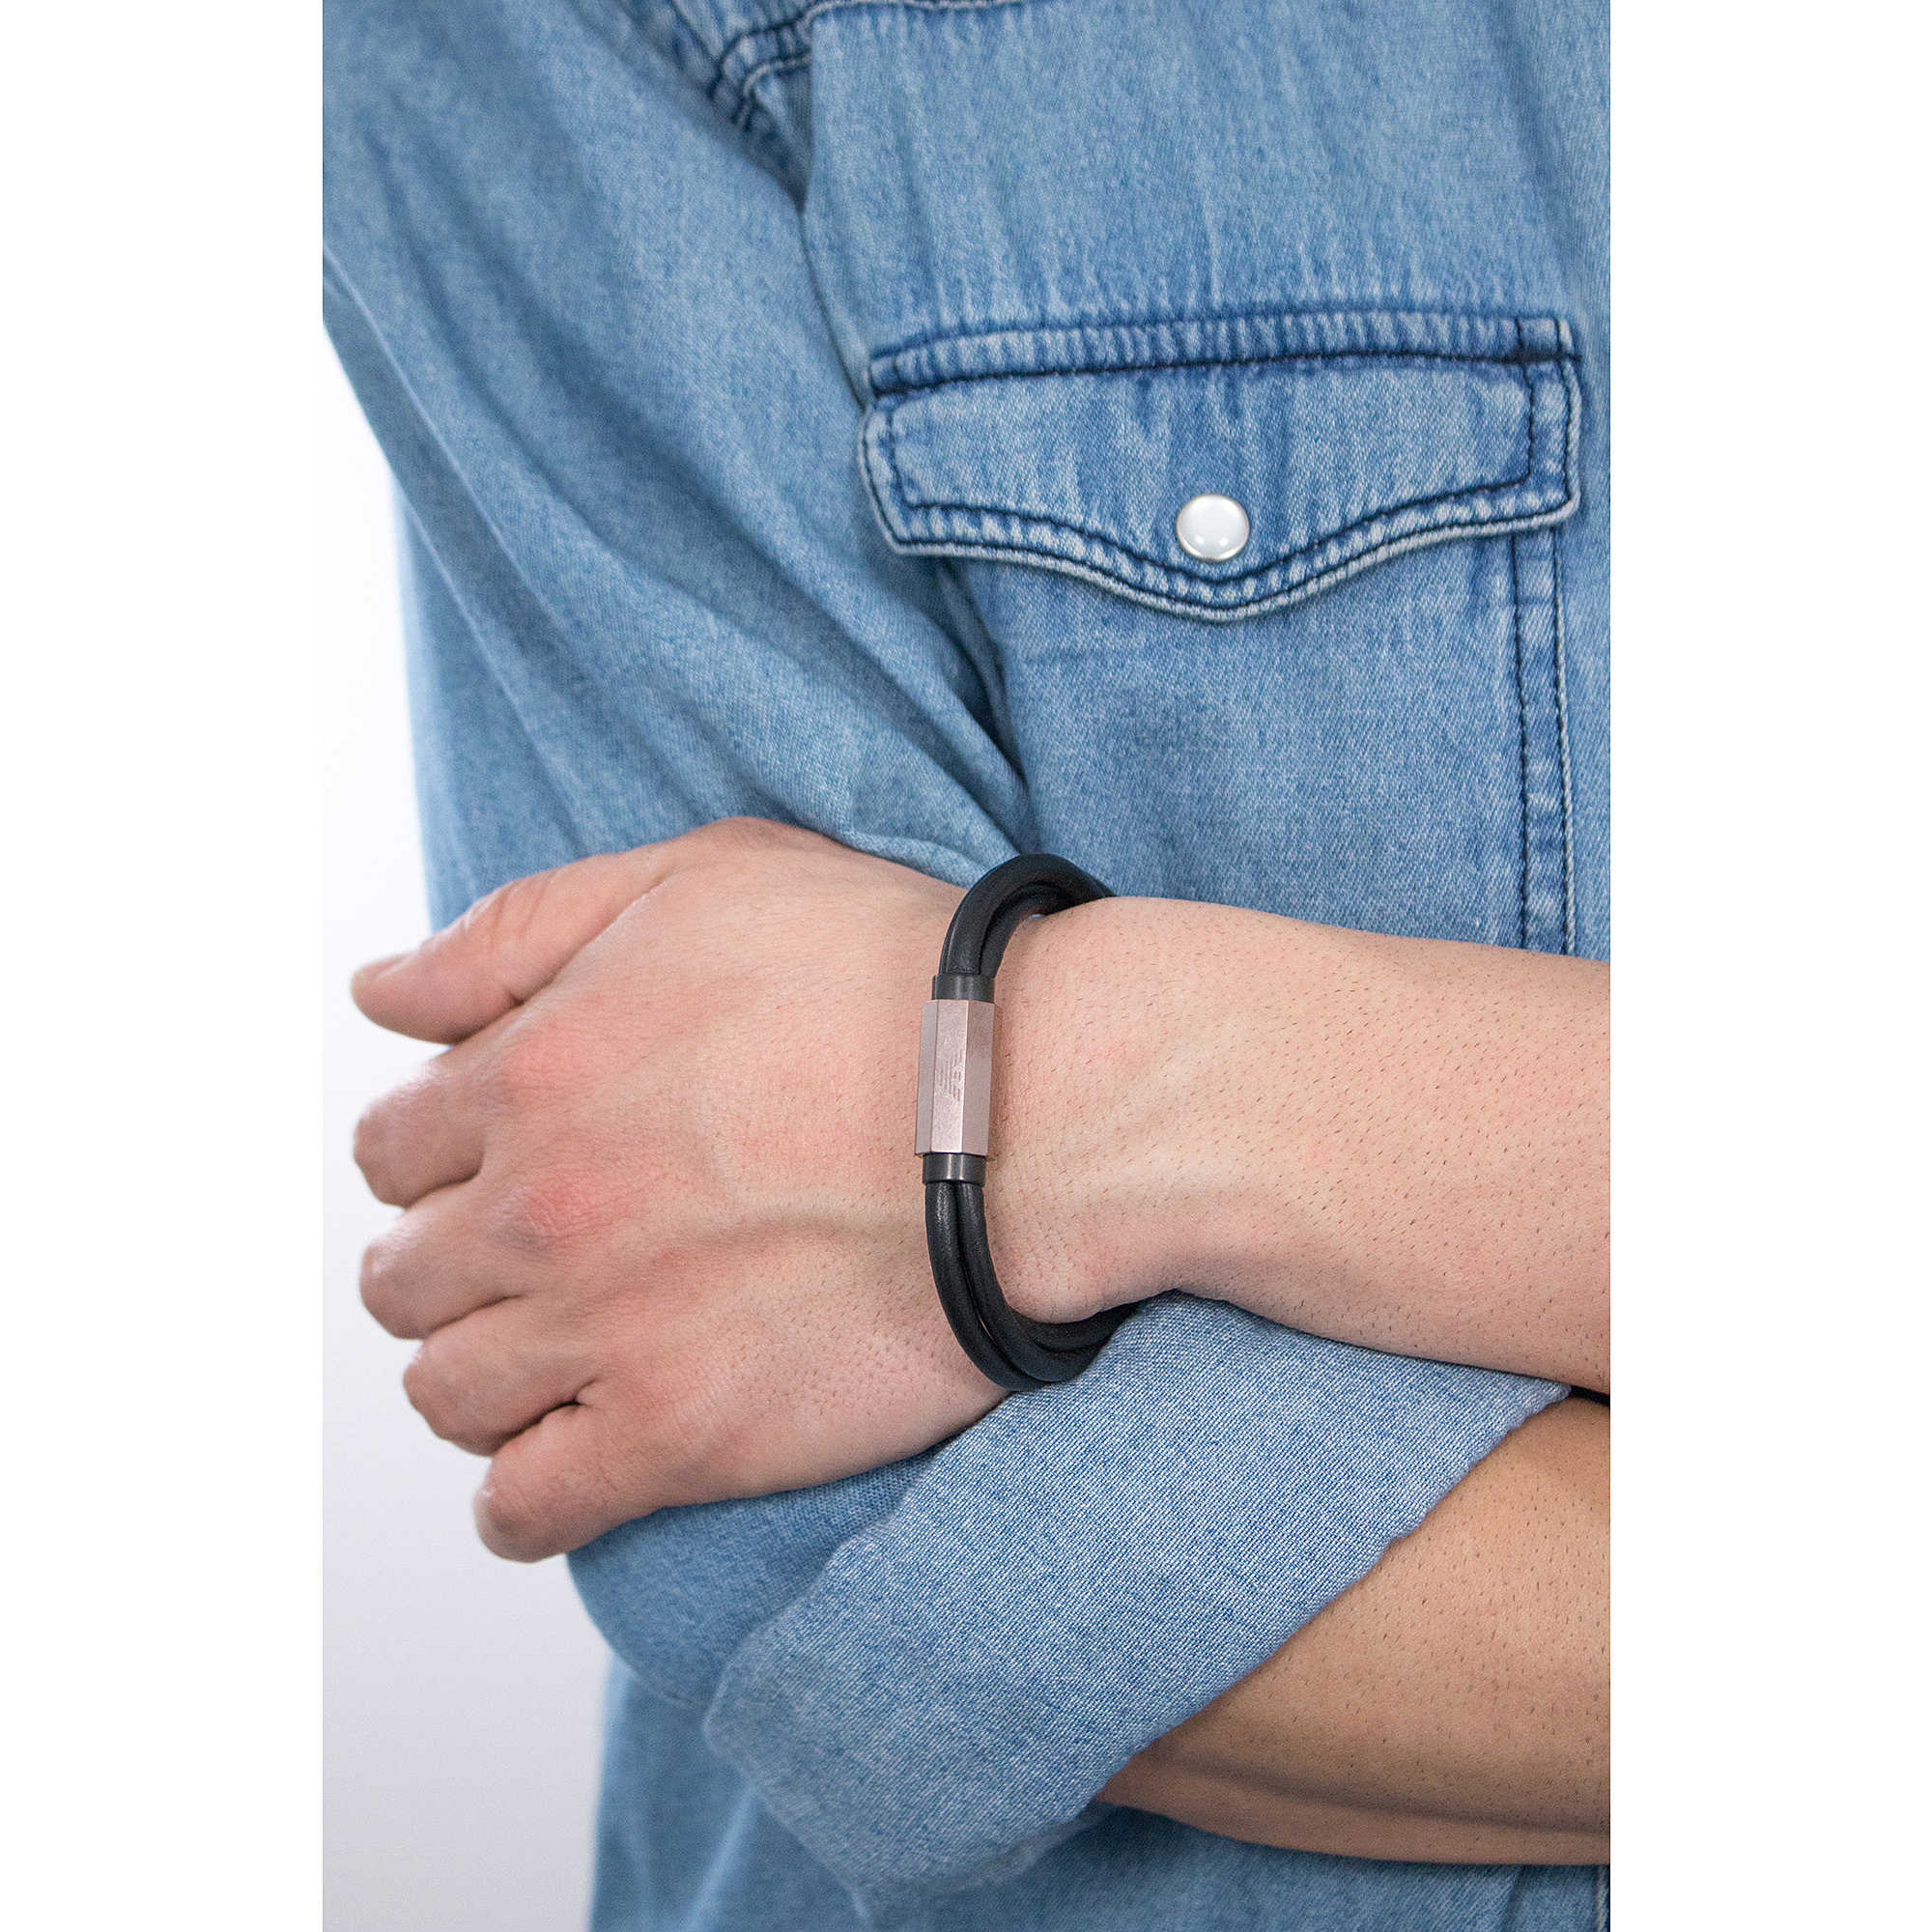 zoom. package bracelets Emporio Armani EGS2434200. zoom. bracelet man  jewellery Emporio Armani EGS2434200 164aa5bffdb